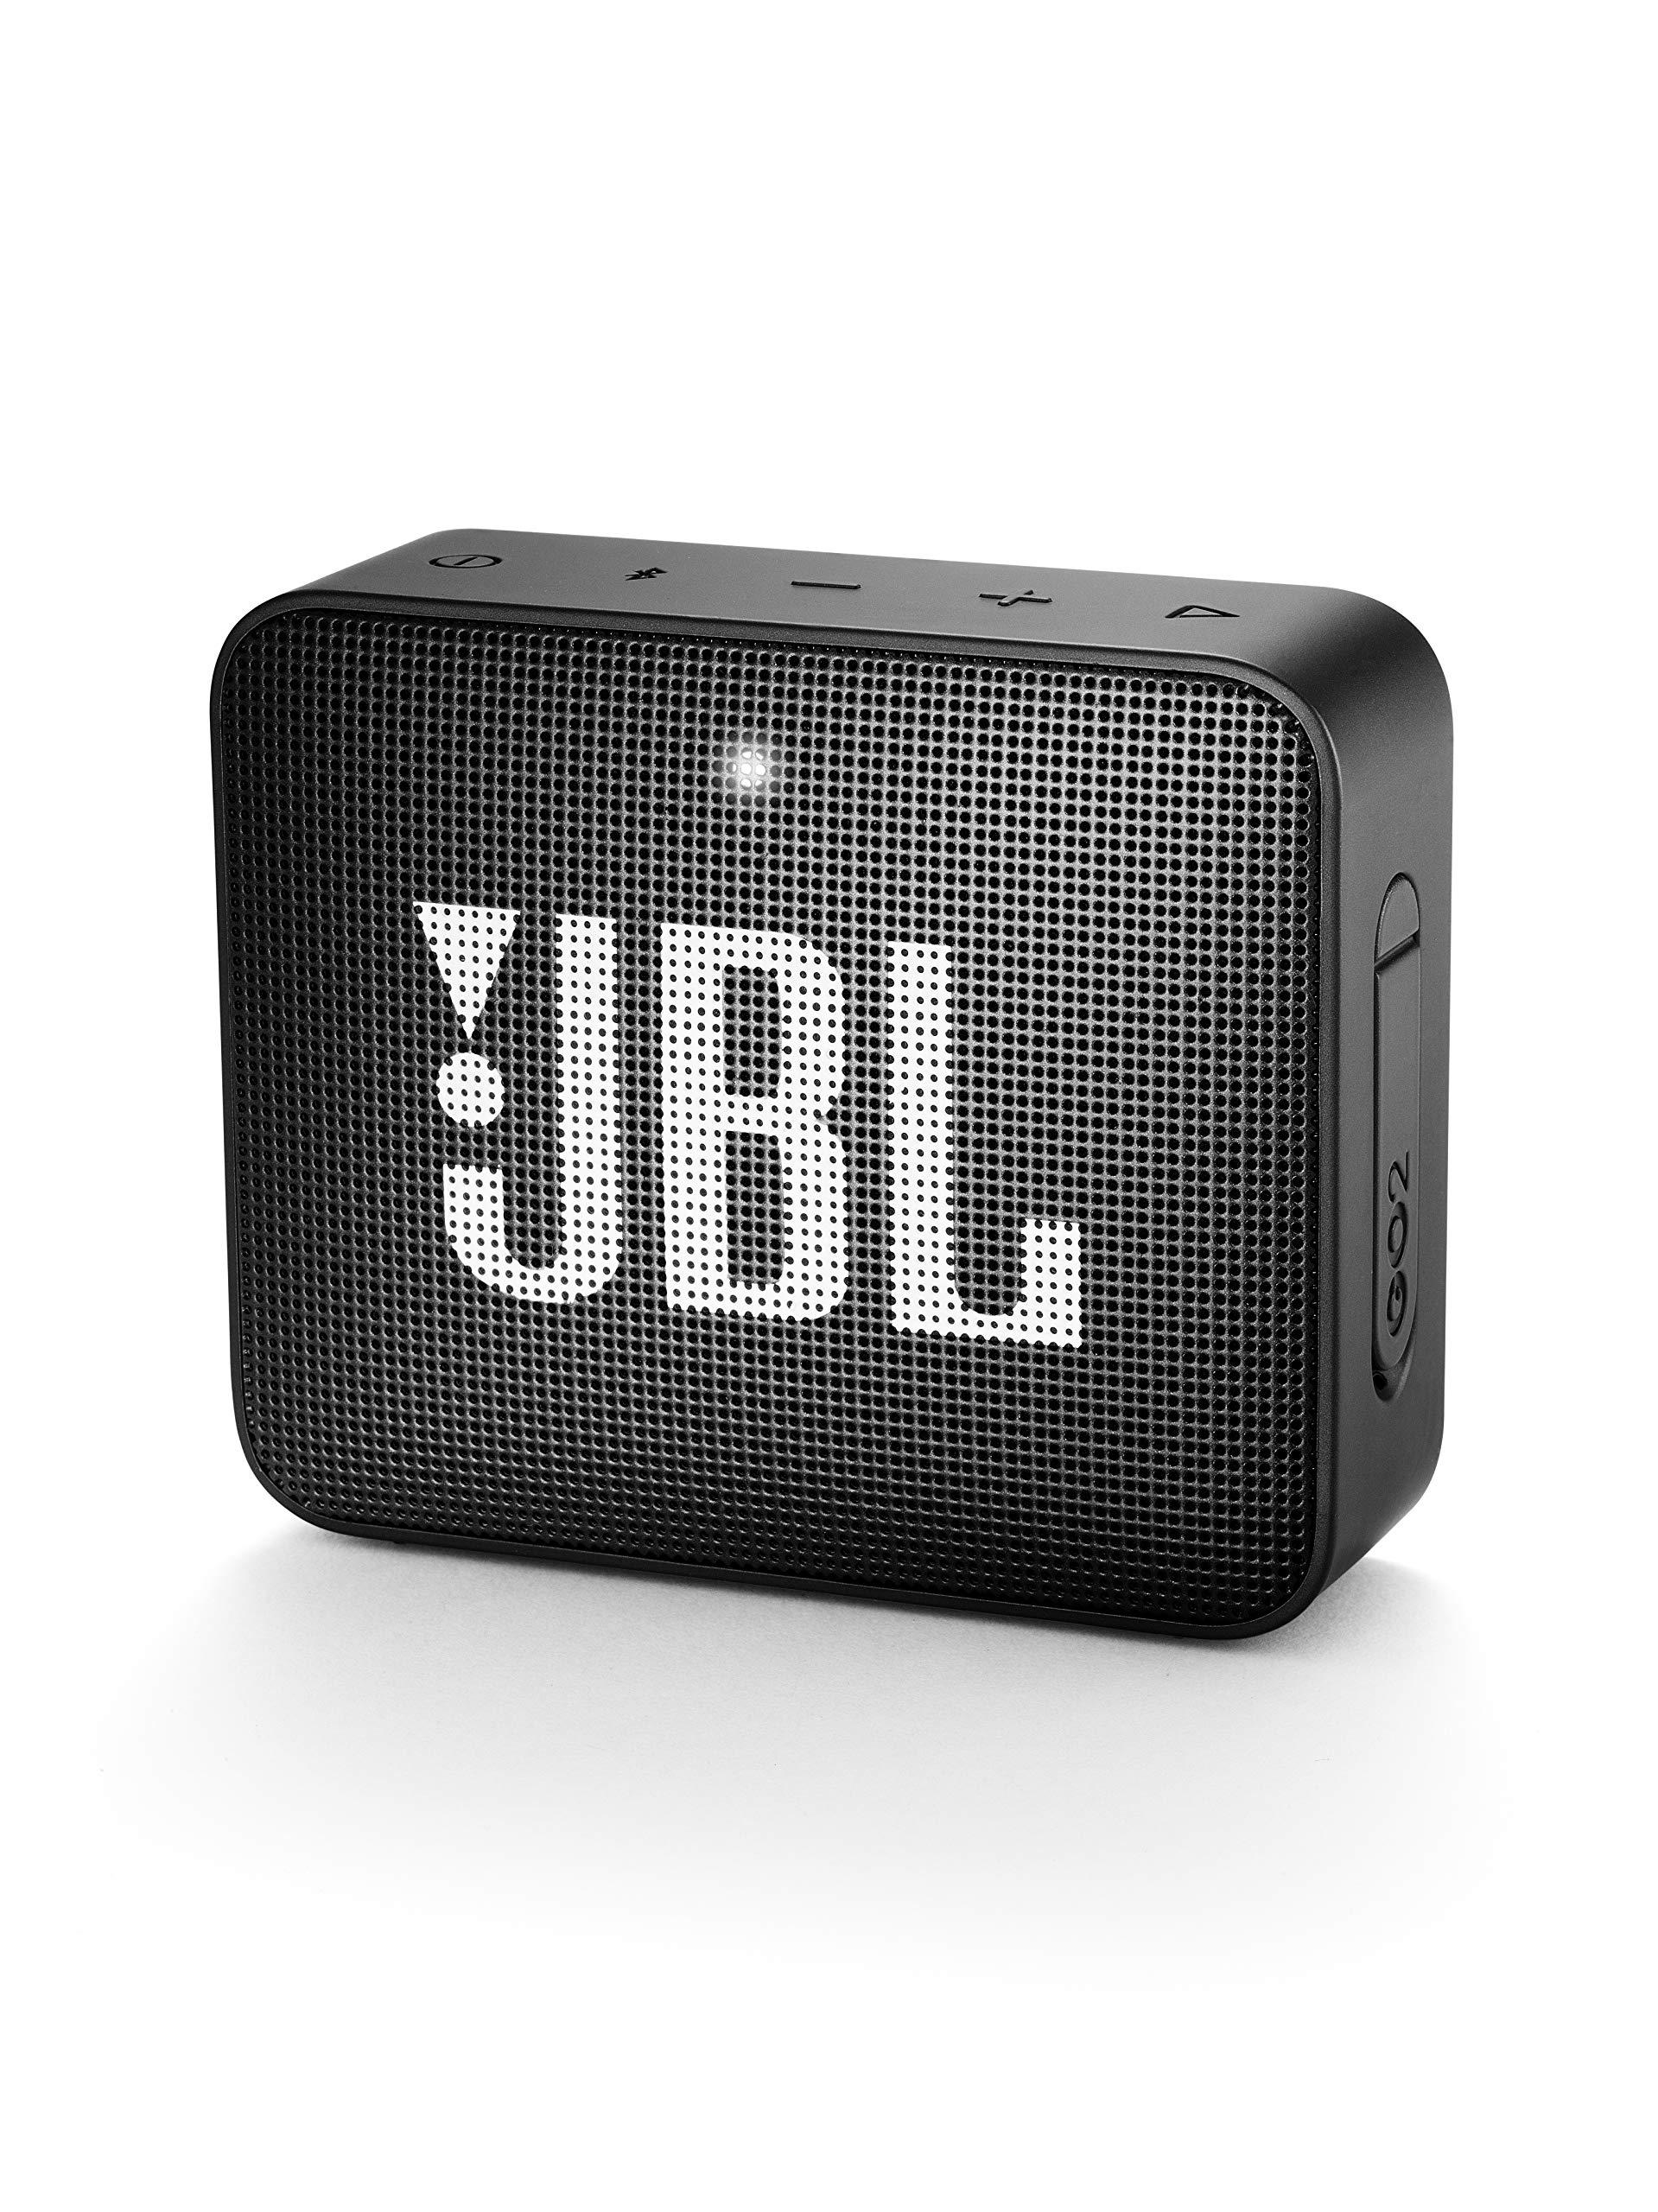 JBL GO 2 Portable Waterproof Bluetooth Speaker (Midnight Black) by JBL